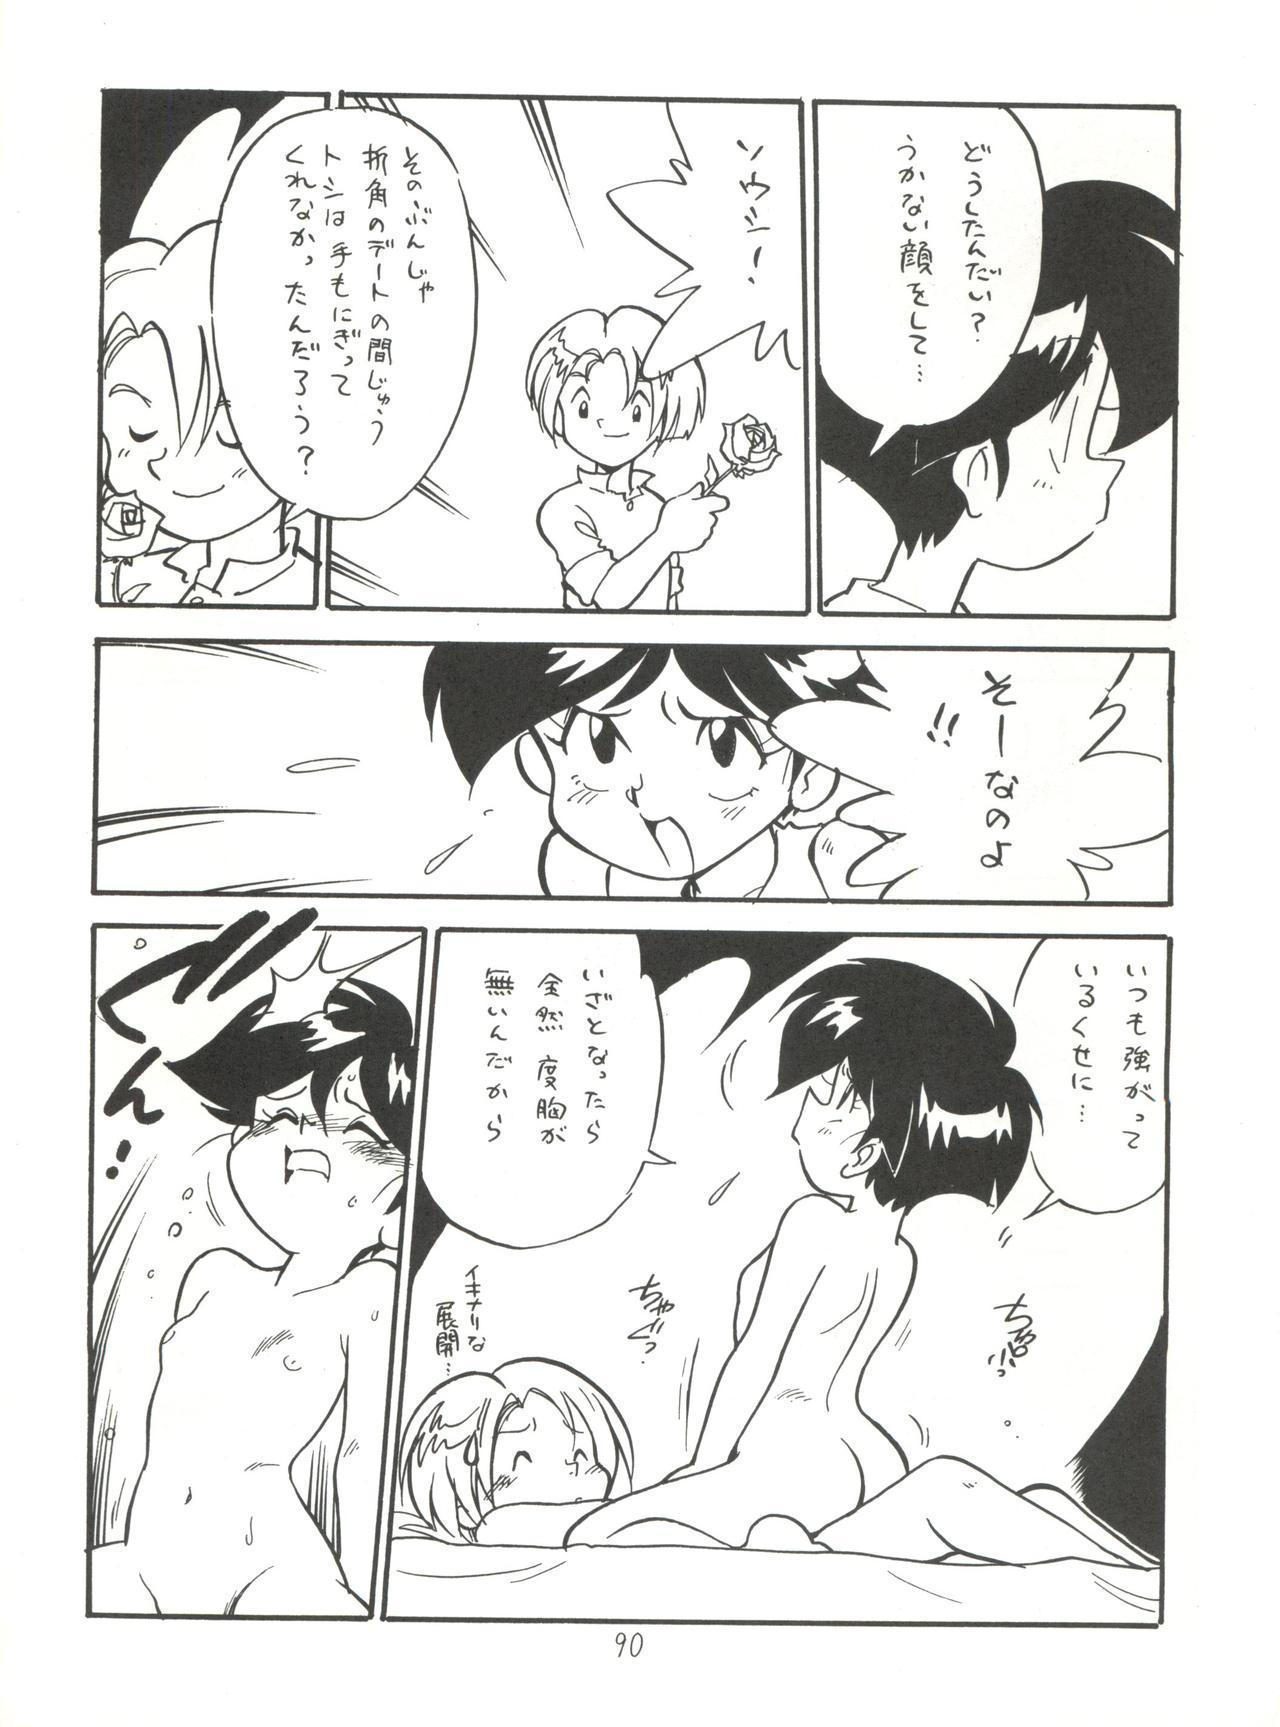 Heart o Migakukkya Nai 89